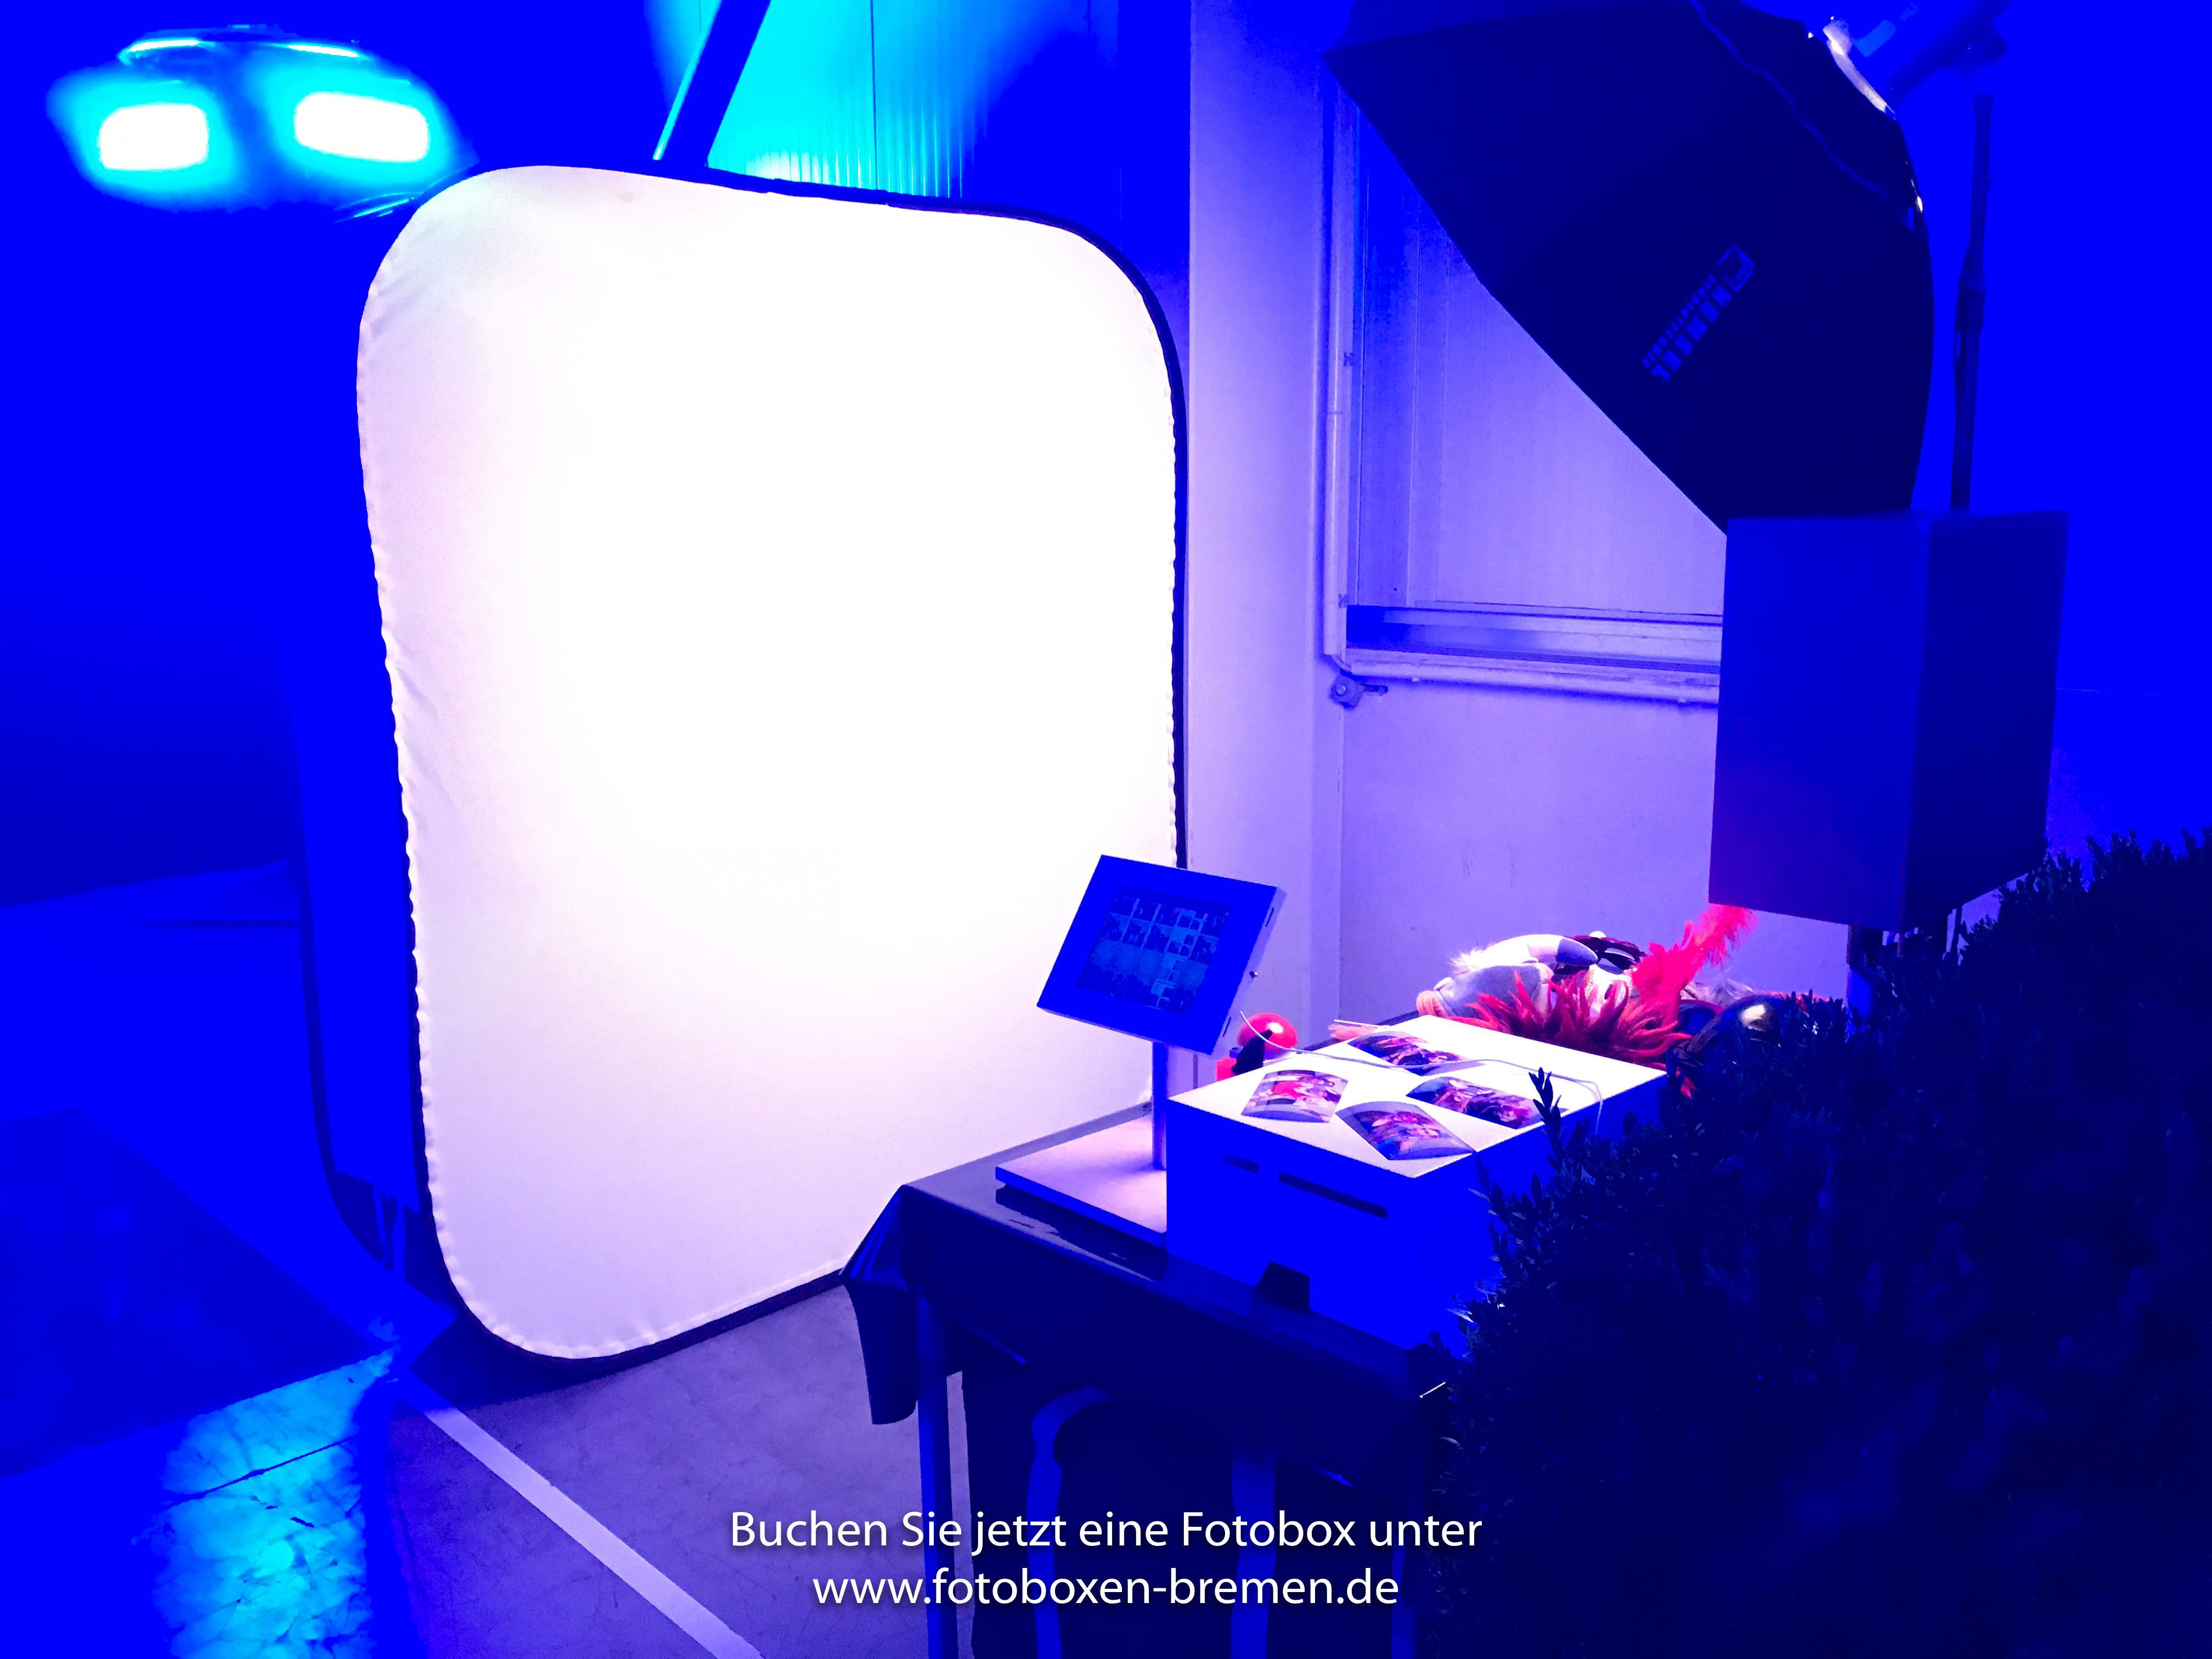 Fotobox Firmenjubiläum - Fotobox Bremen mieten